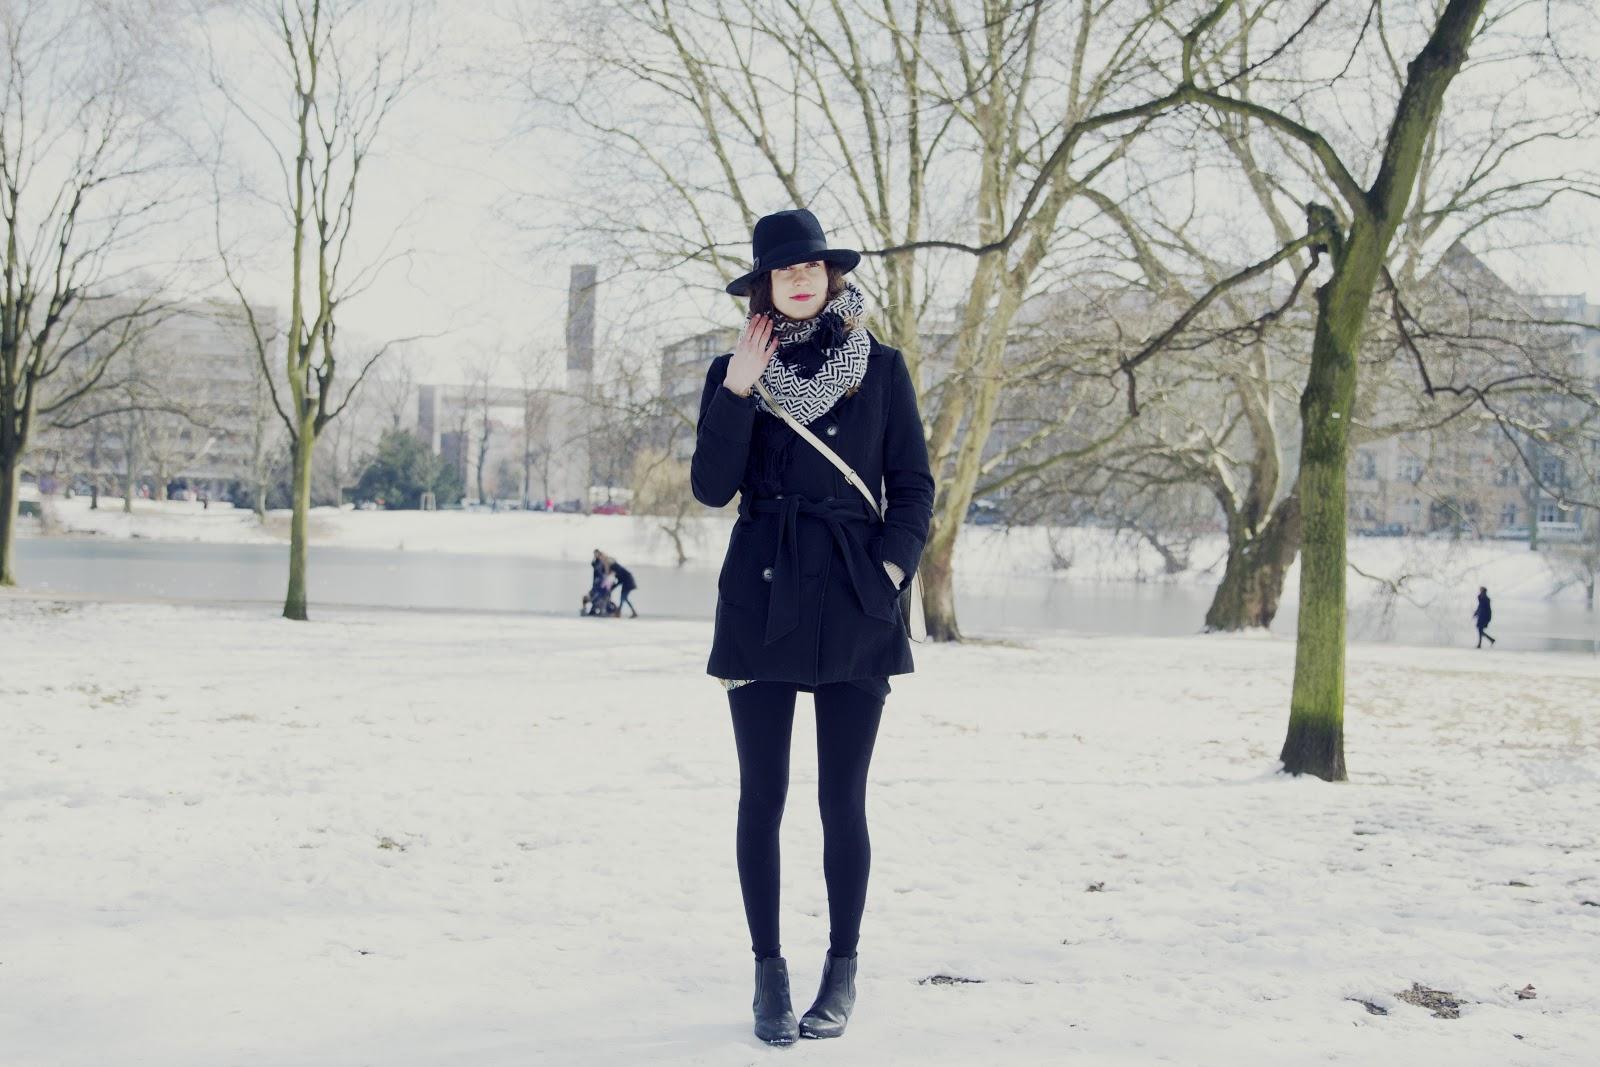 winter wonderland in march heylilahey. Black Bedroom Furniture Sets. Home Design Ideas